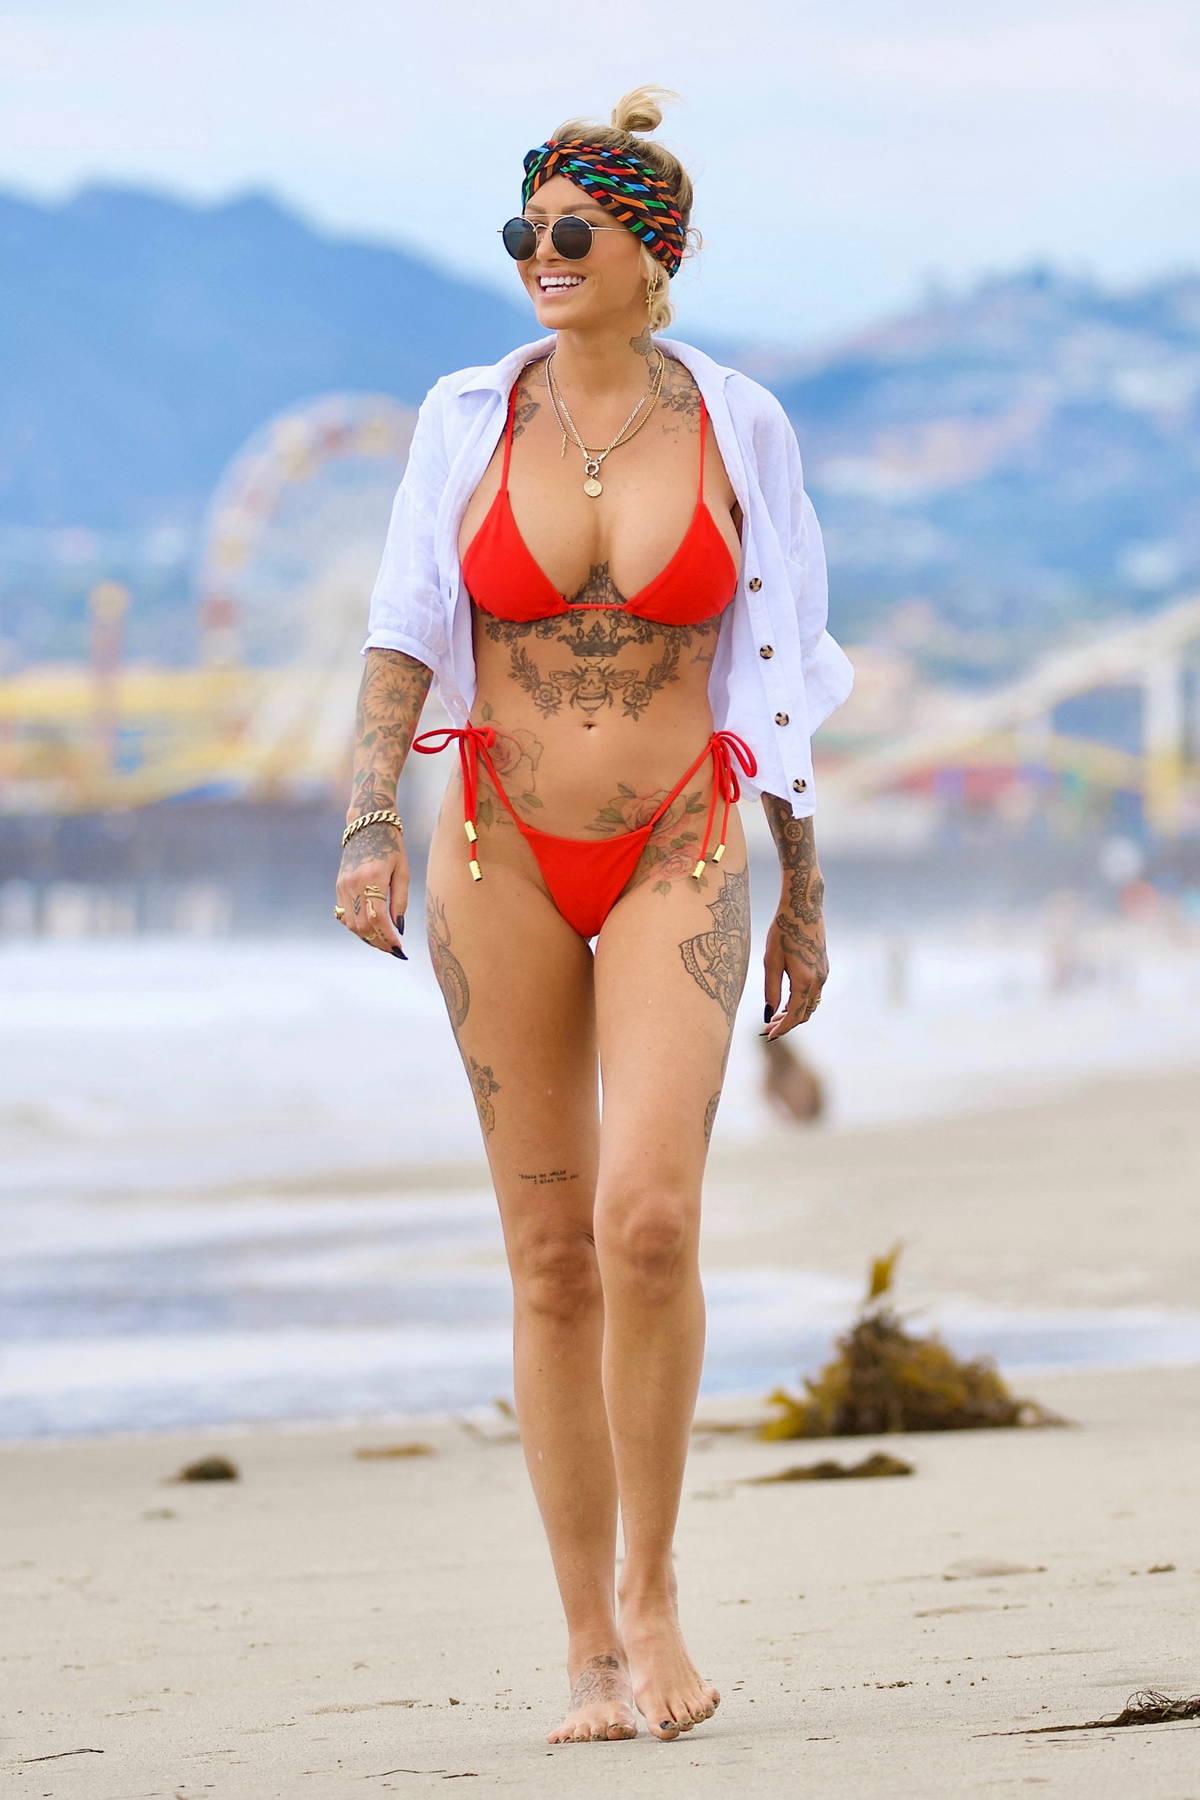 Tina Louise sizzles in a red bikini while enjoying a beach day with new boyfriend Brett Oppenheim in Venice Beach, California